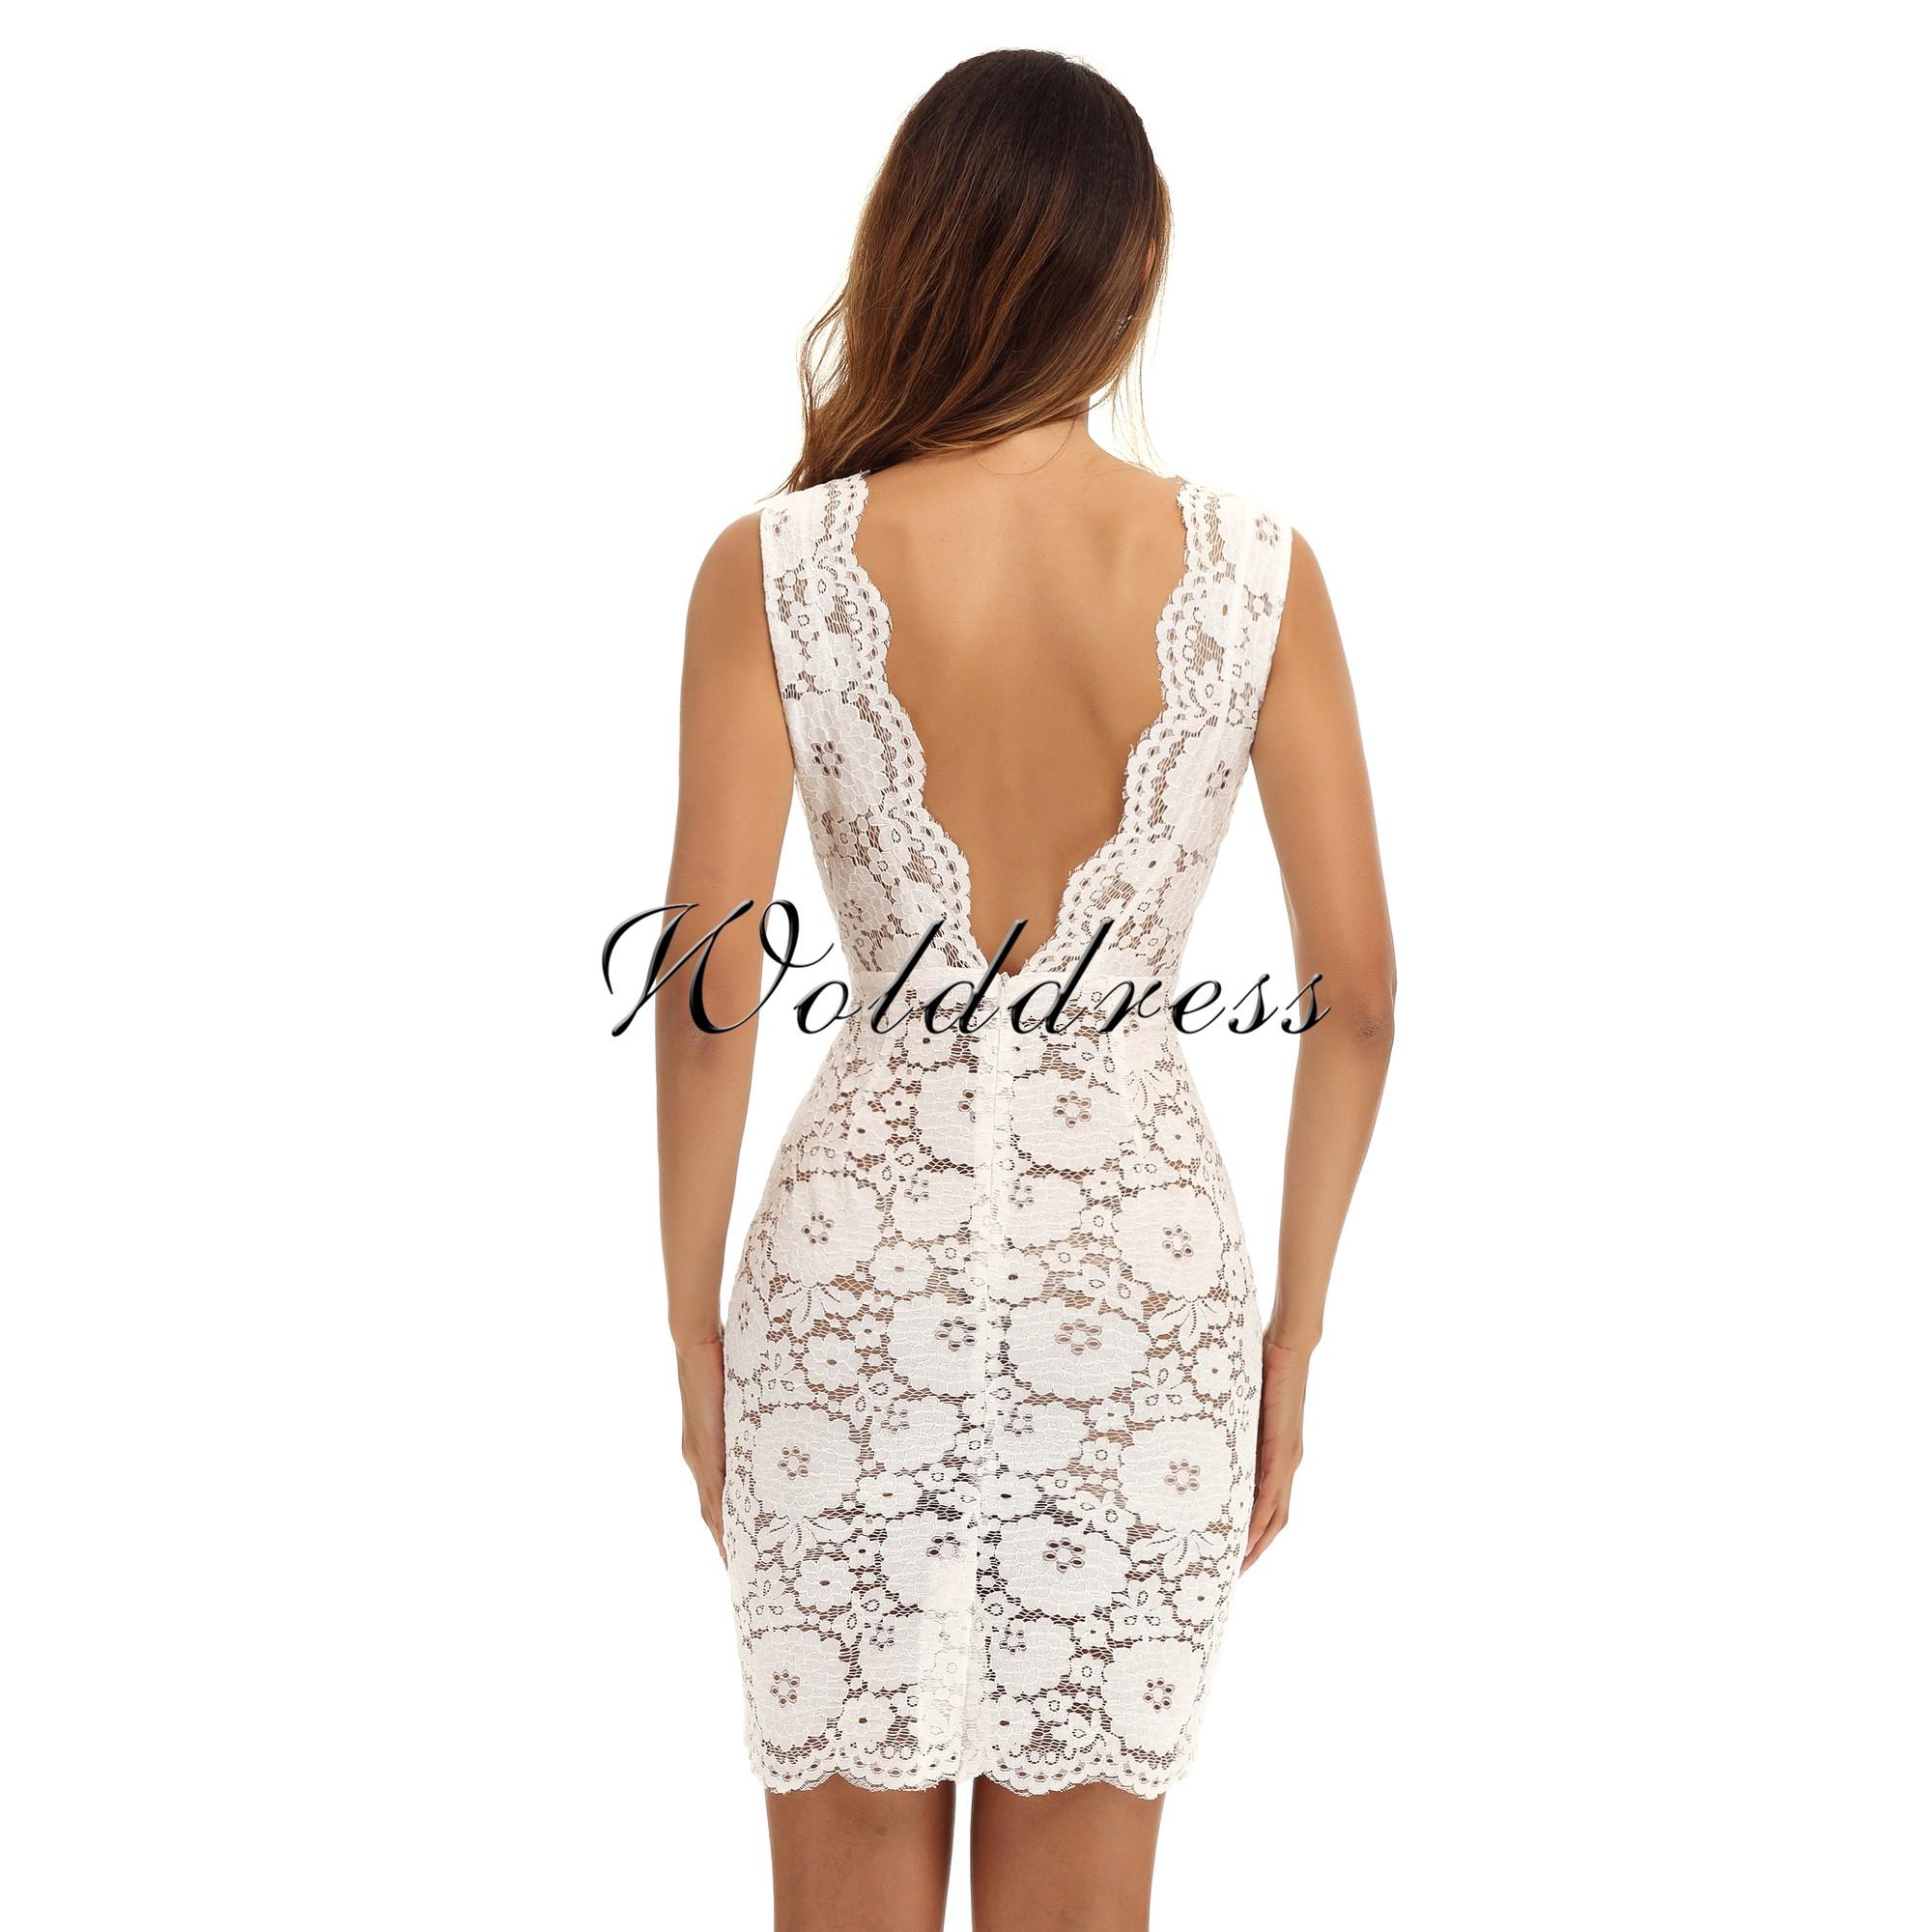 White V Neck Sleeveless One Piece Lace Breast Fashion Dress HG299-White